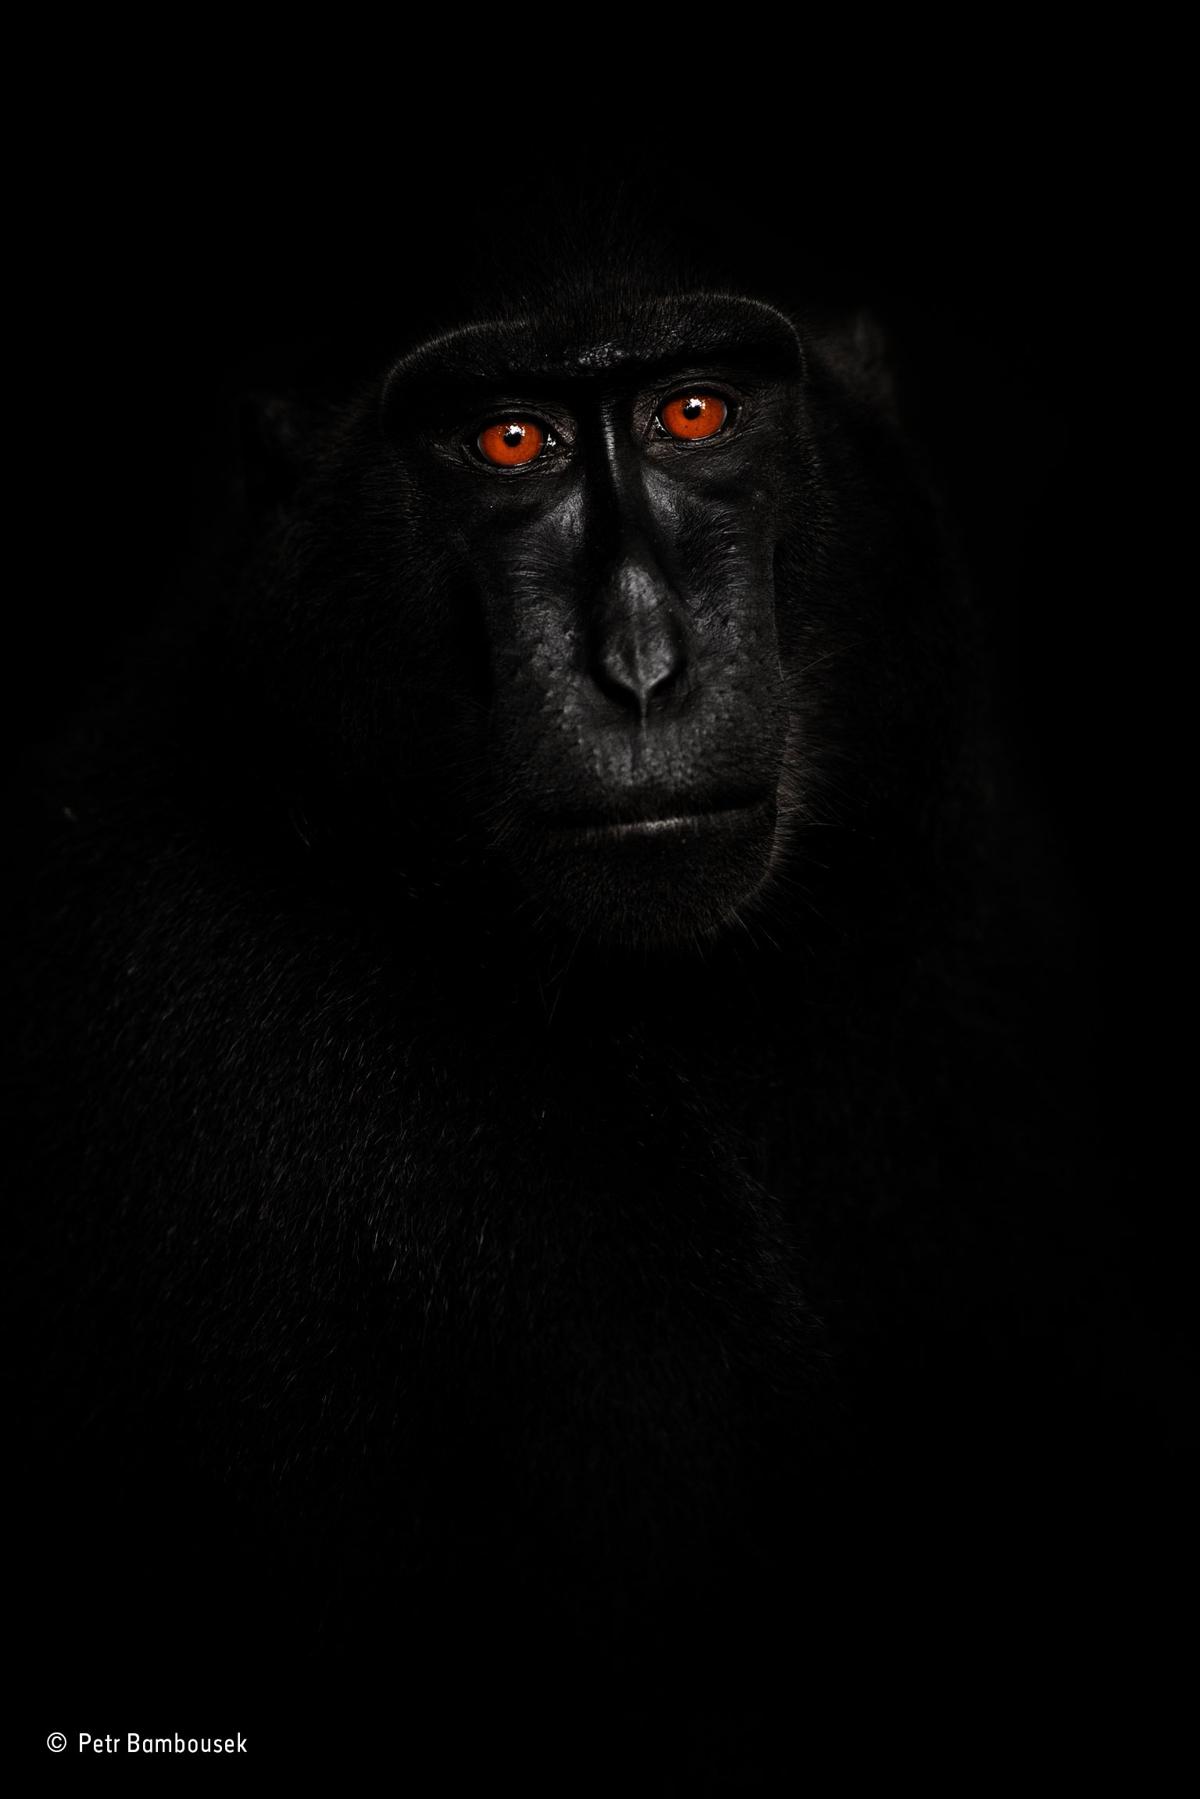 Reflection in black, Petr Bambousek, Republica Checa